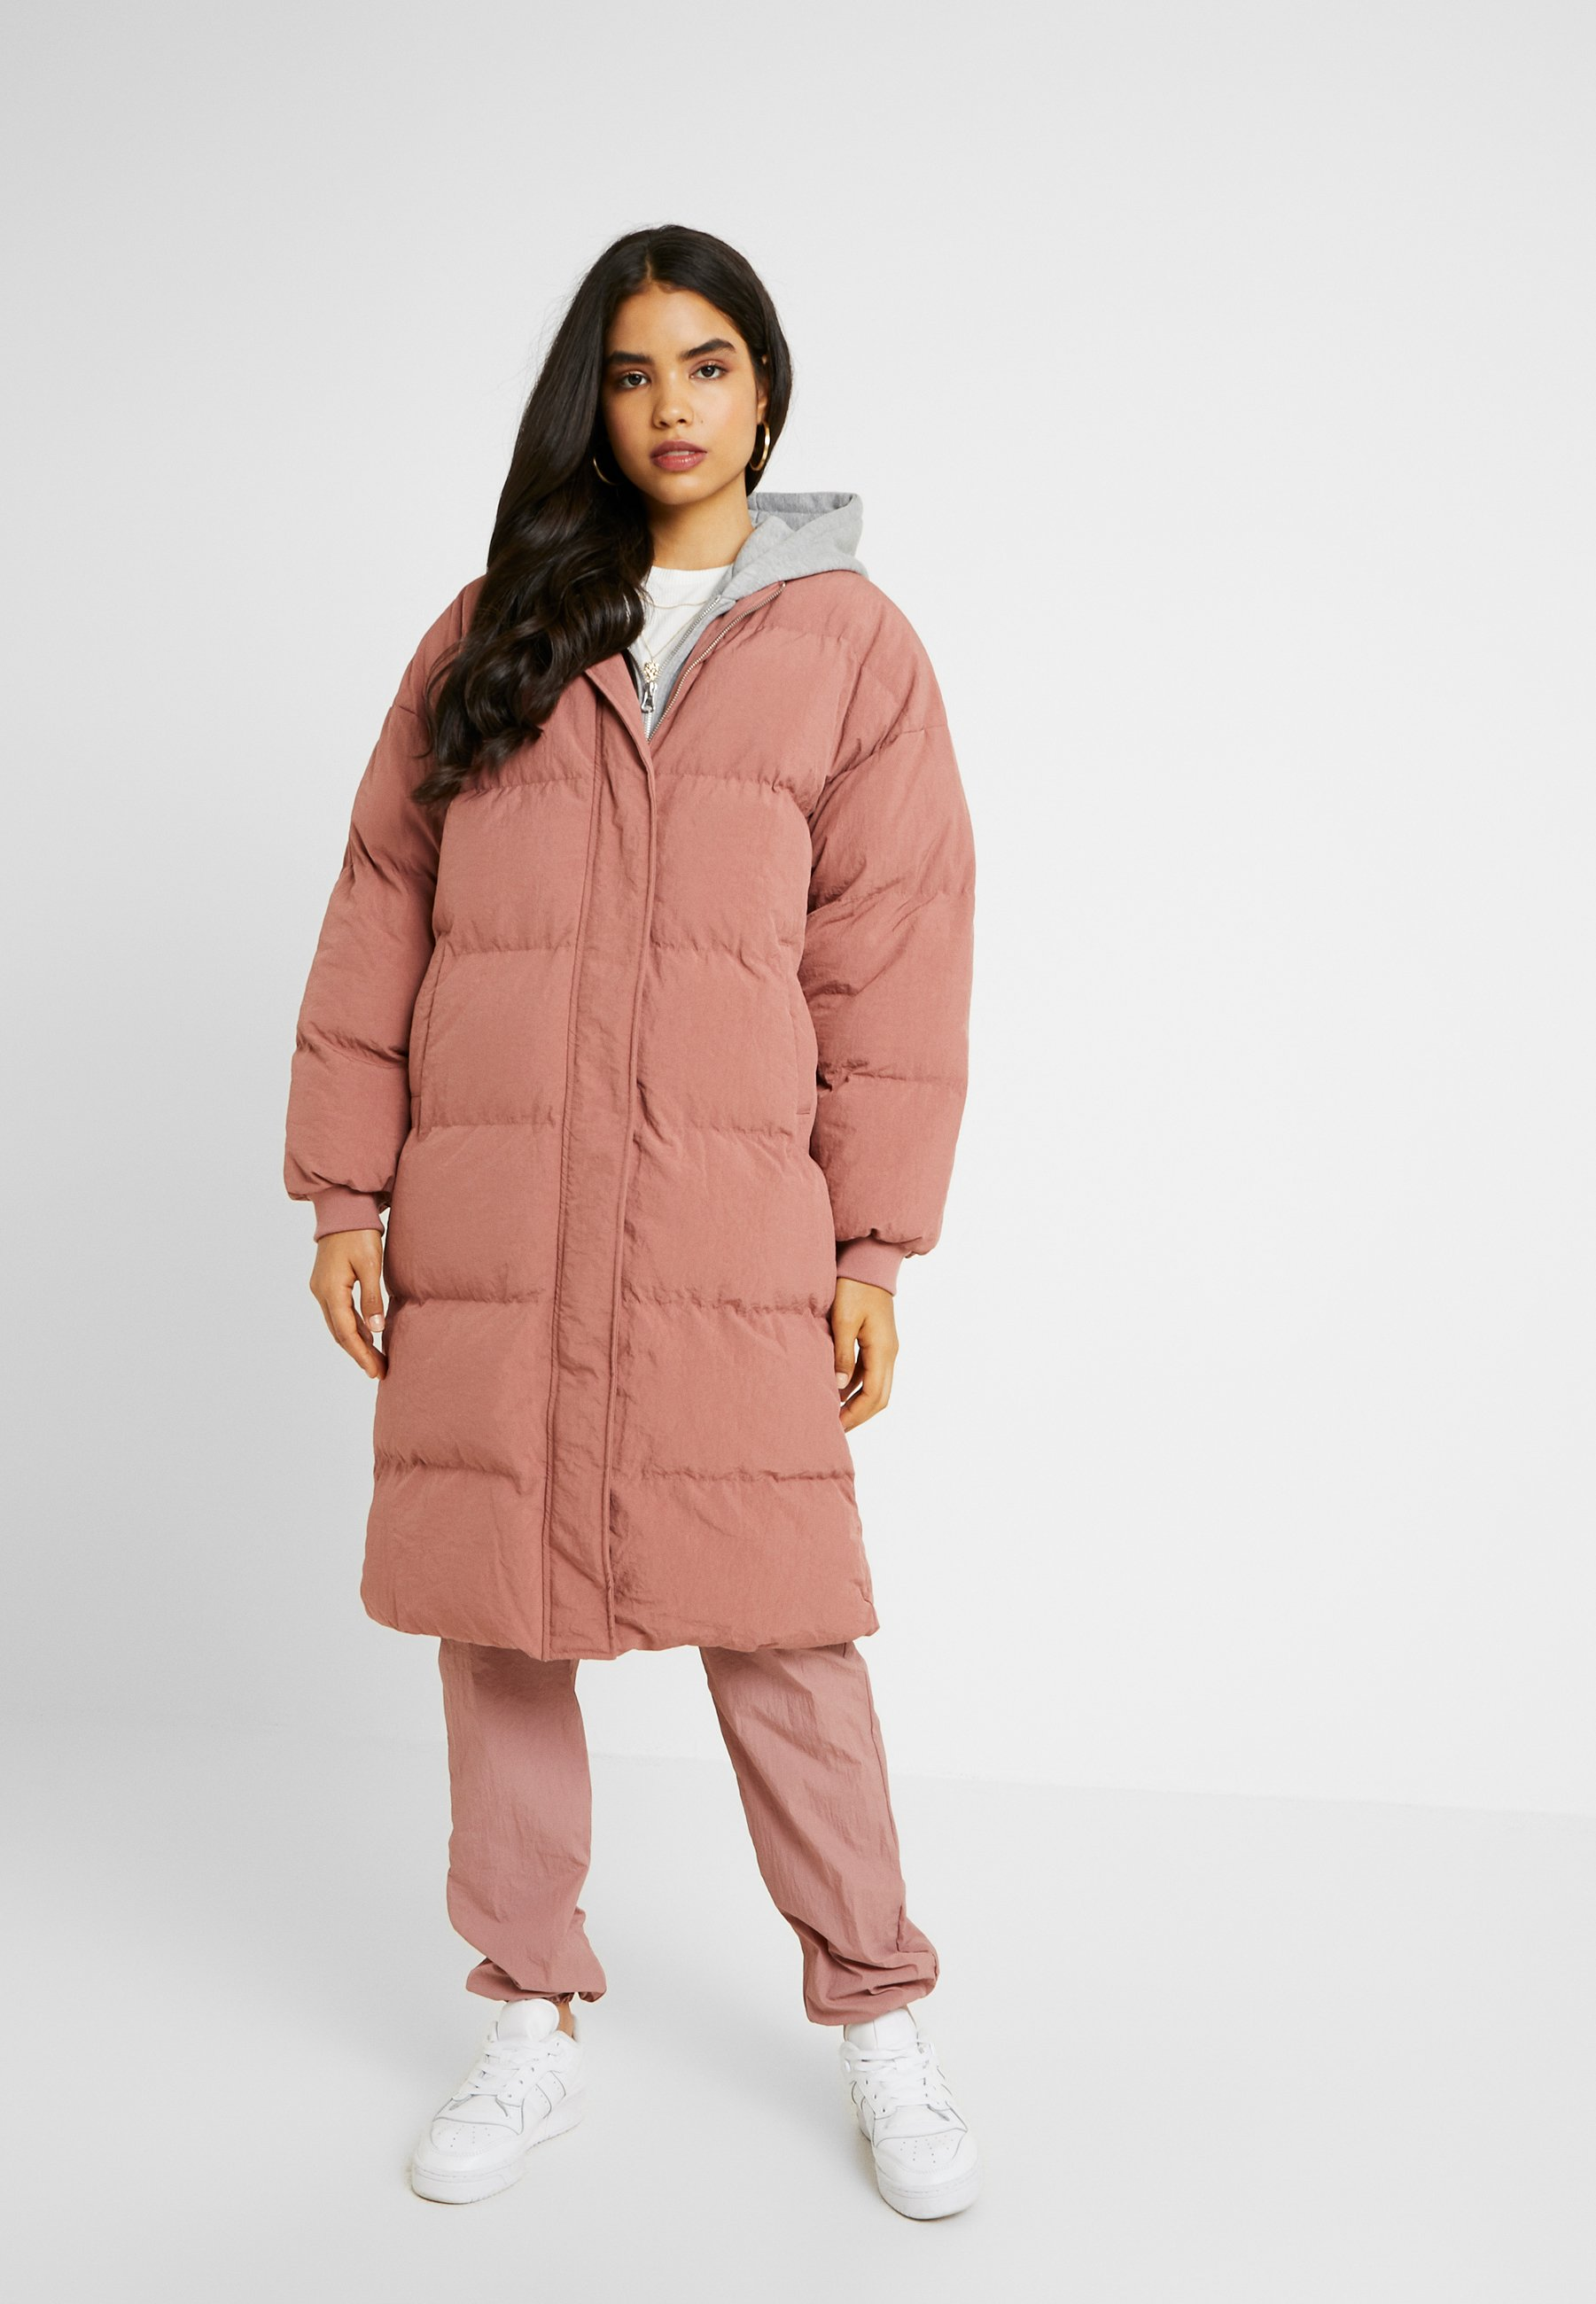 Longline JacketCappotto Missguided Invernale Tall Puffer Pink lKT3FcJ1